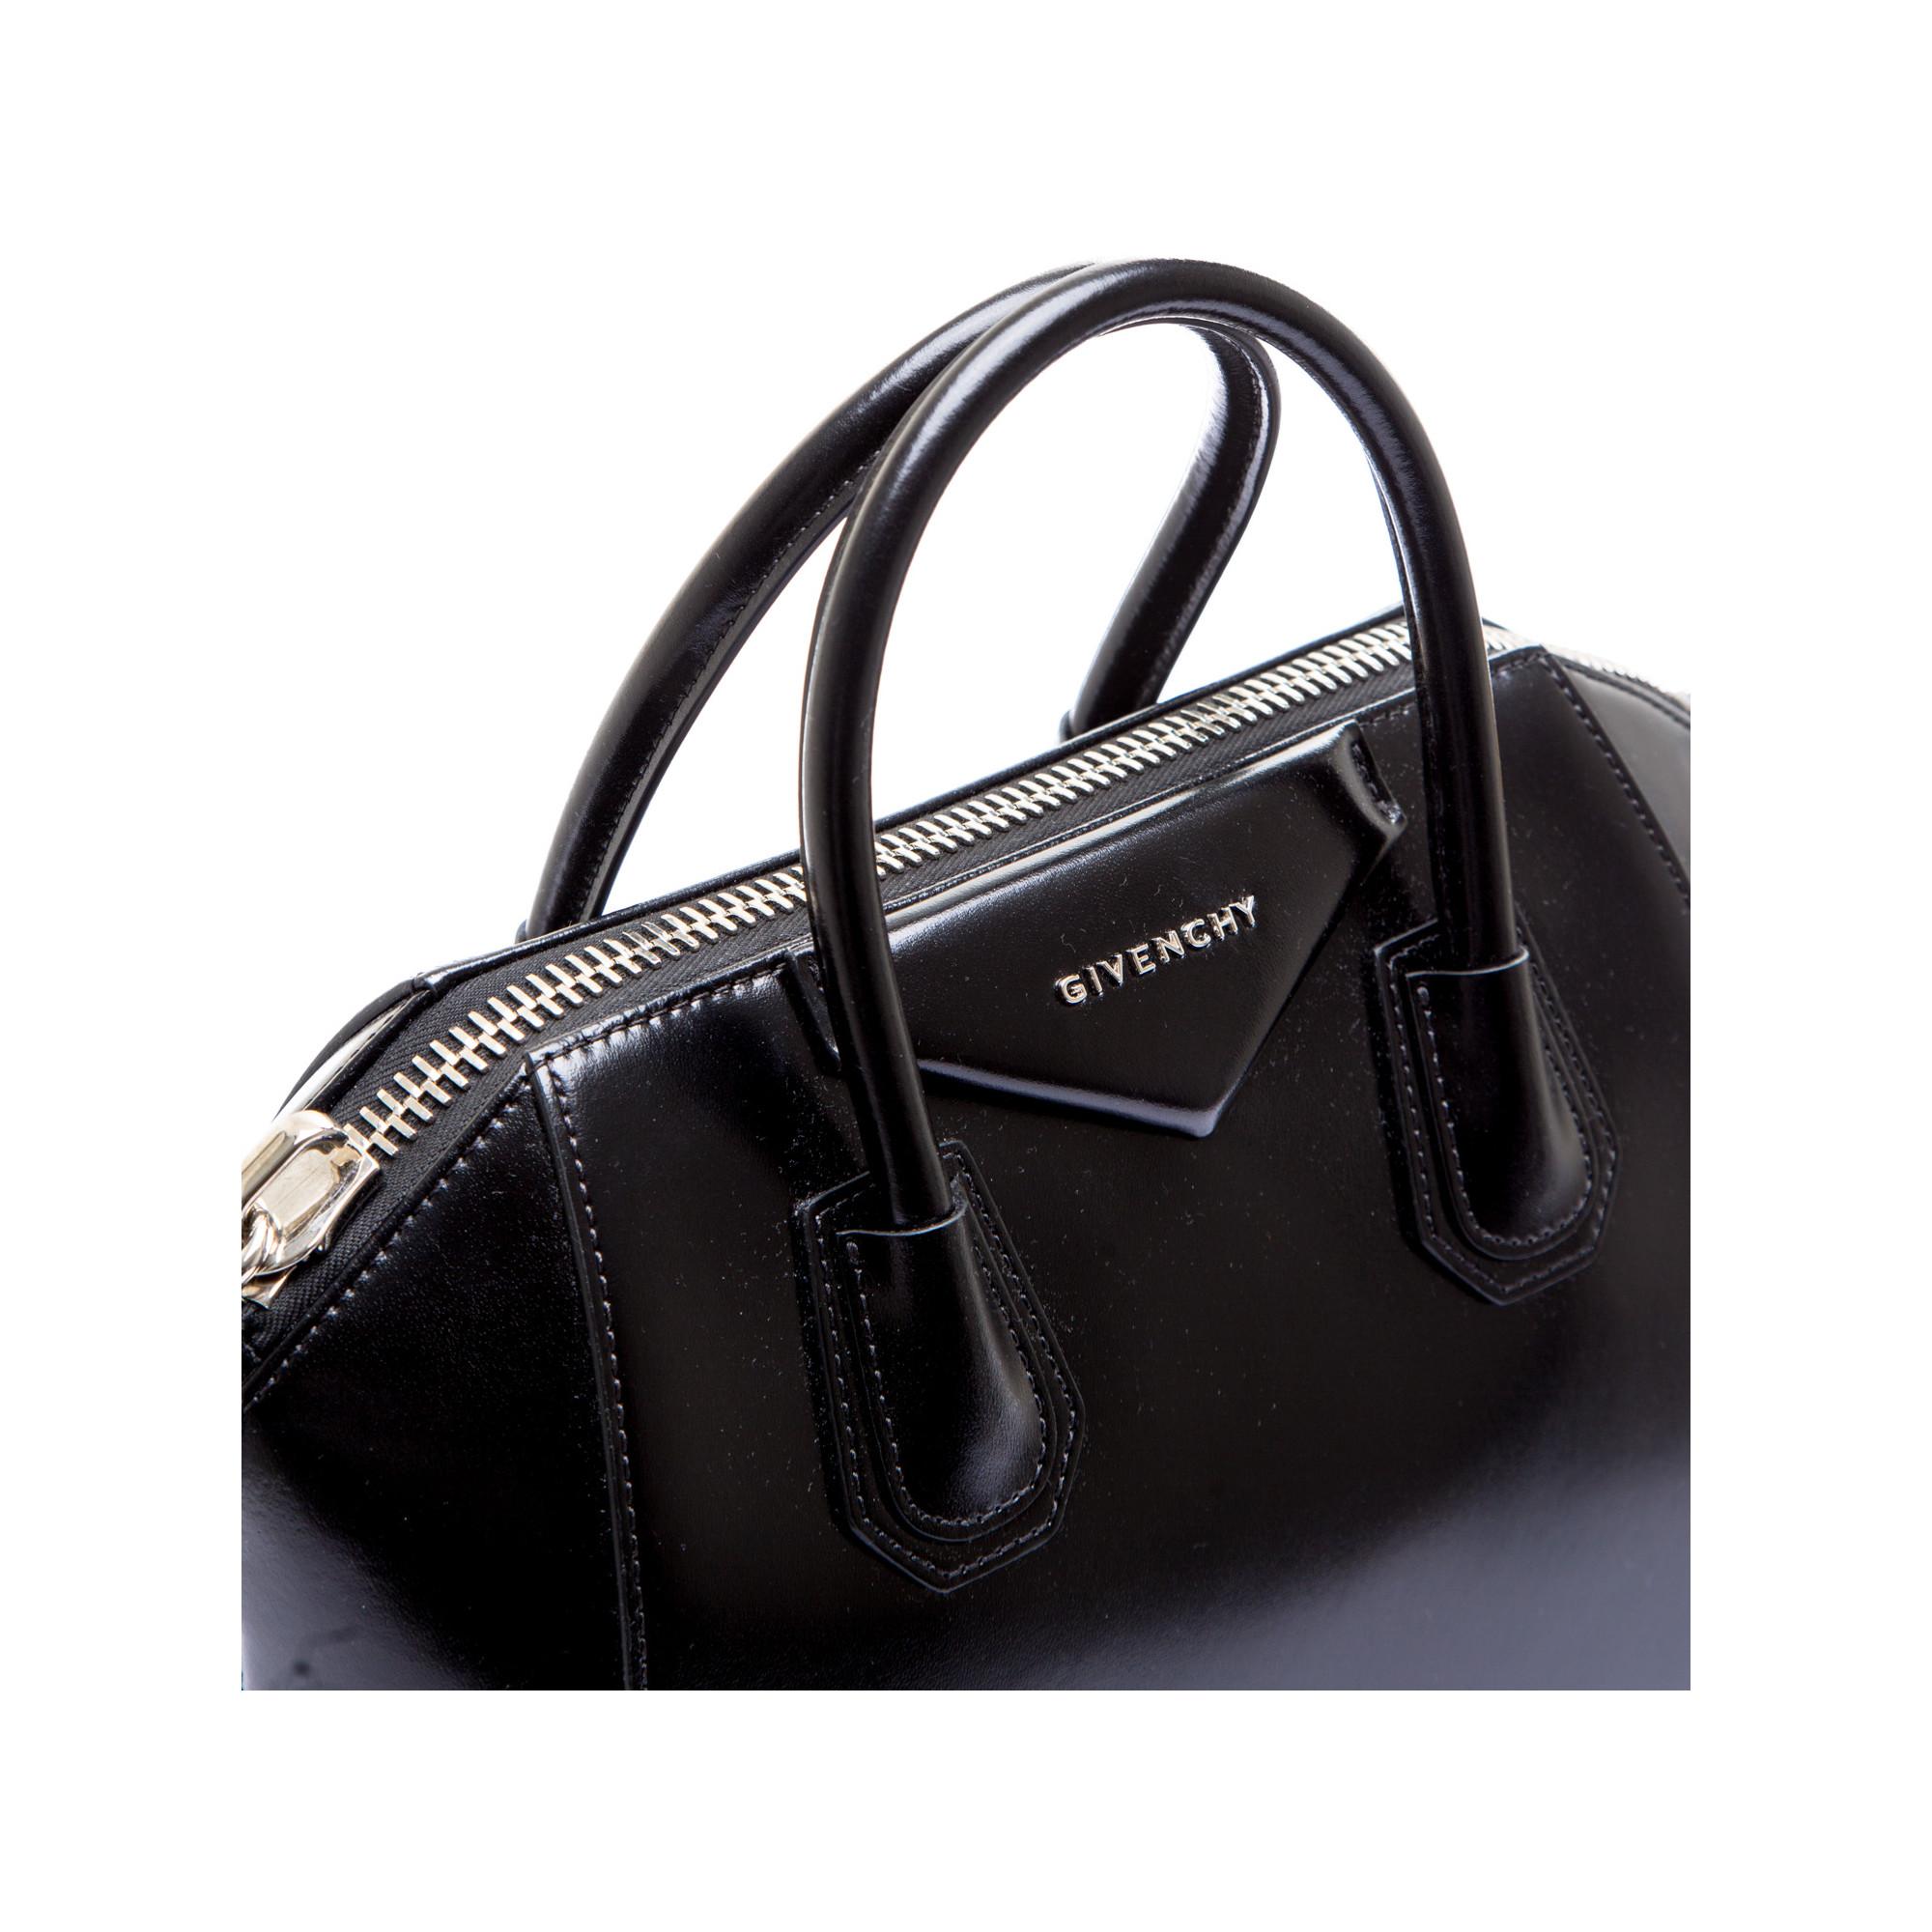 719809147d ... Givenchy antigona bag black Givenchy antigona bag black -  www.derodeloper.com - Derodeloper